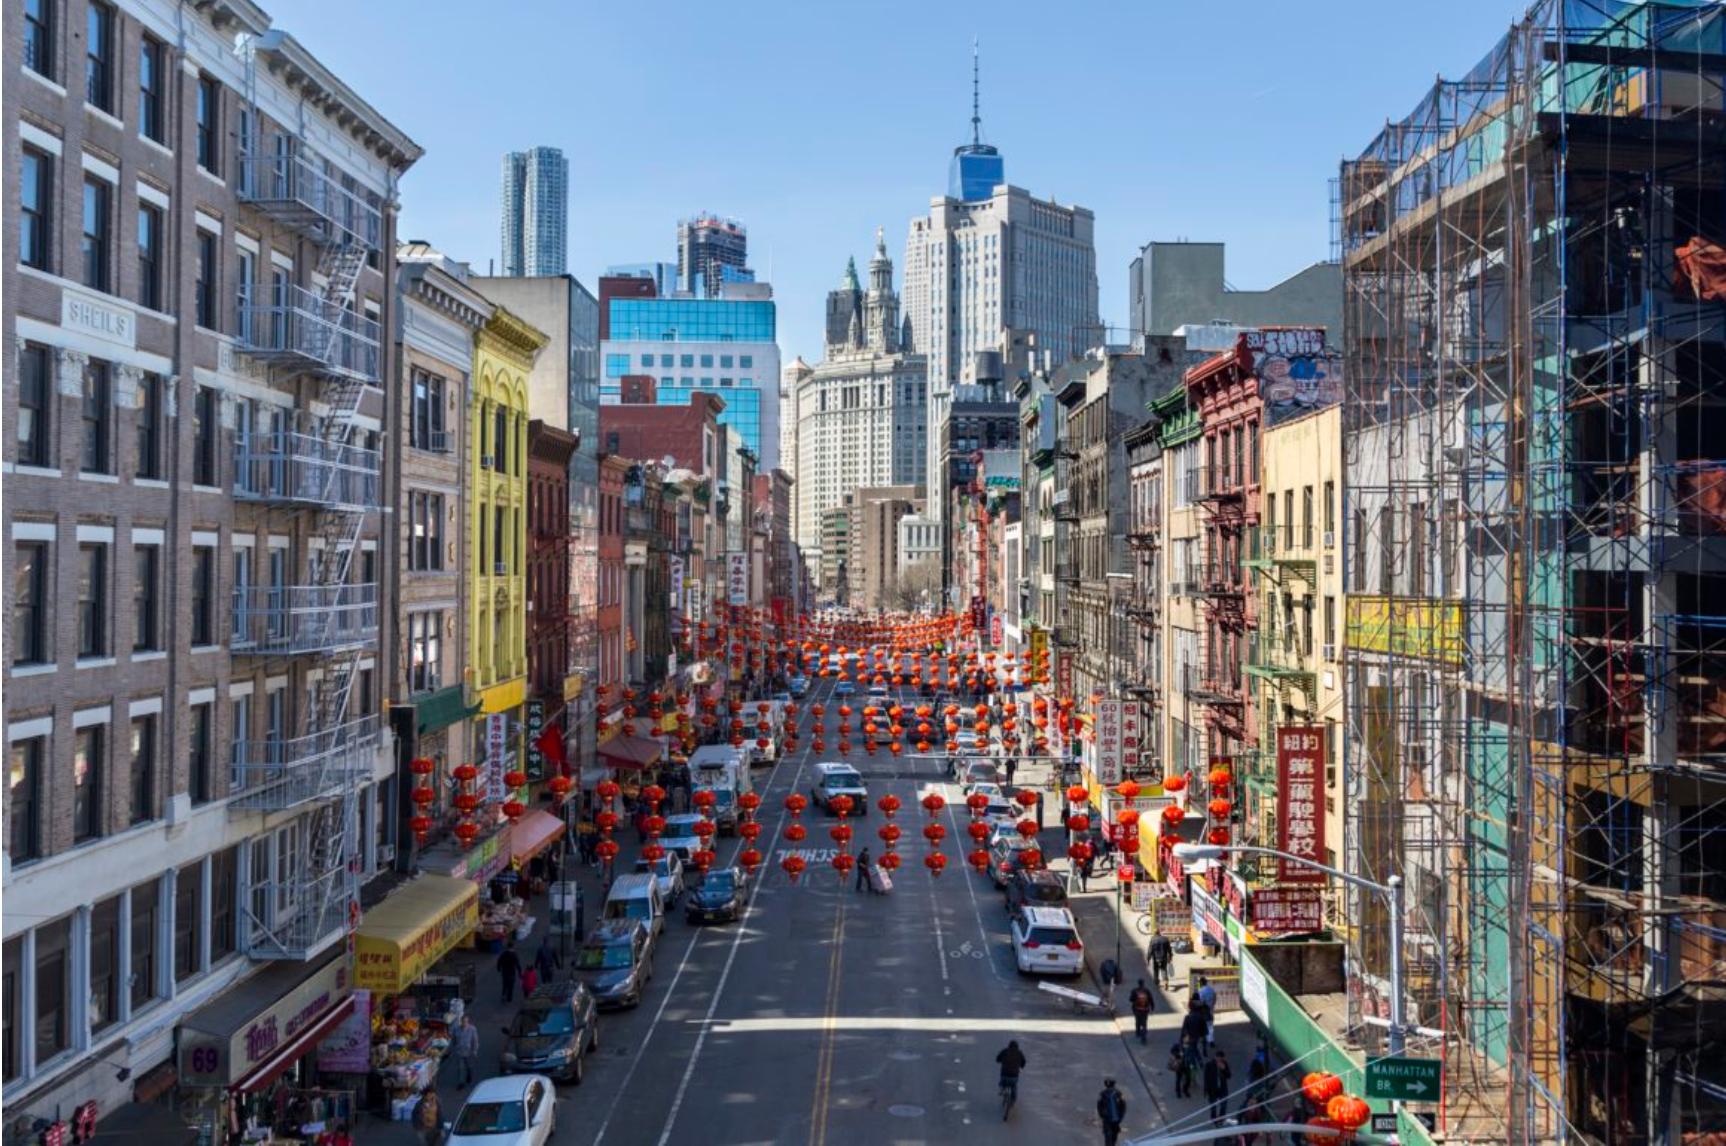 Gateways to Chinatown